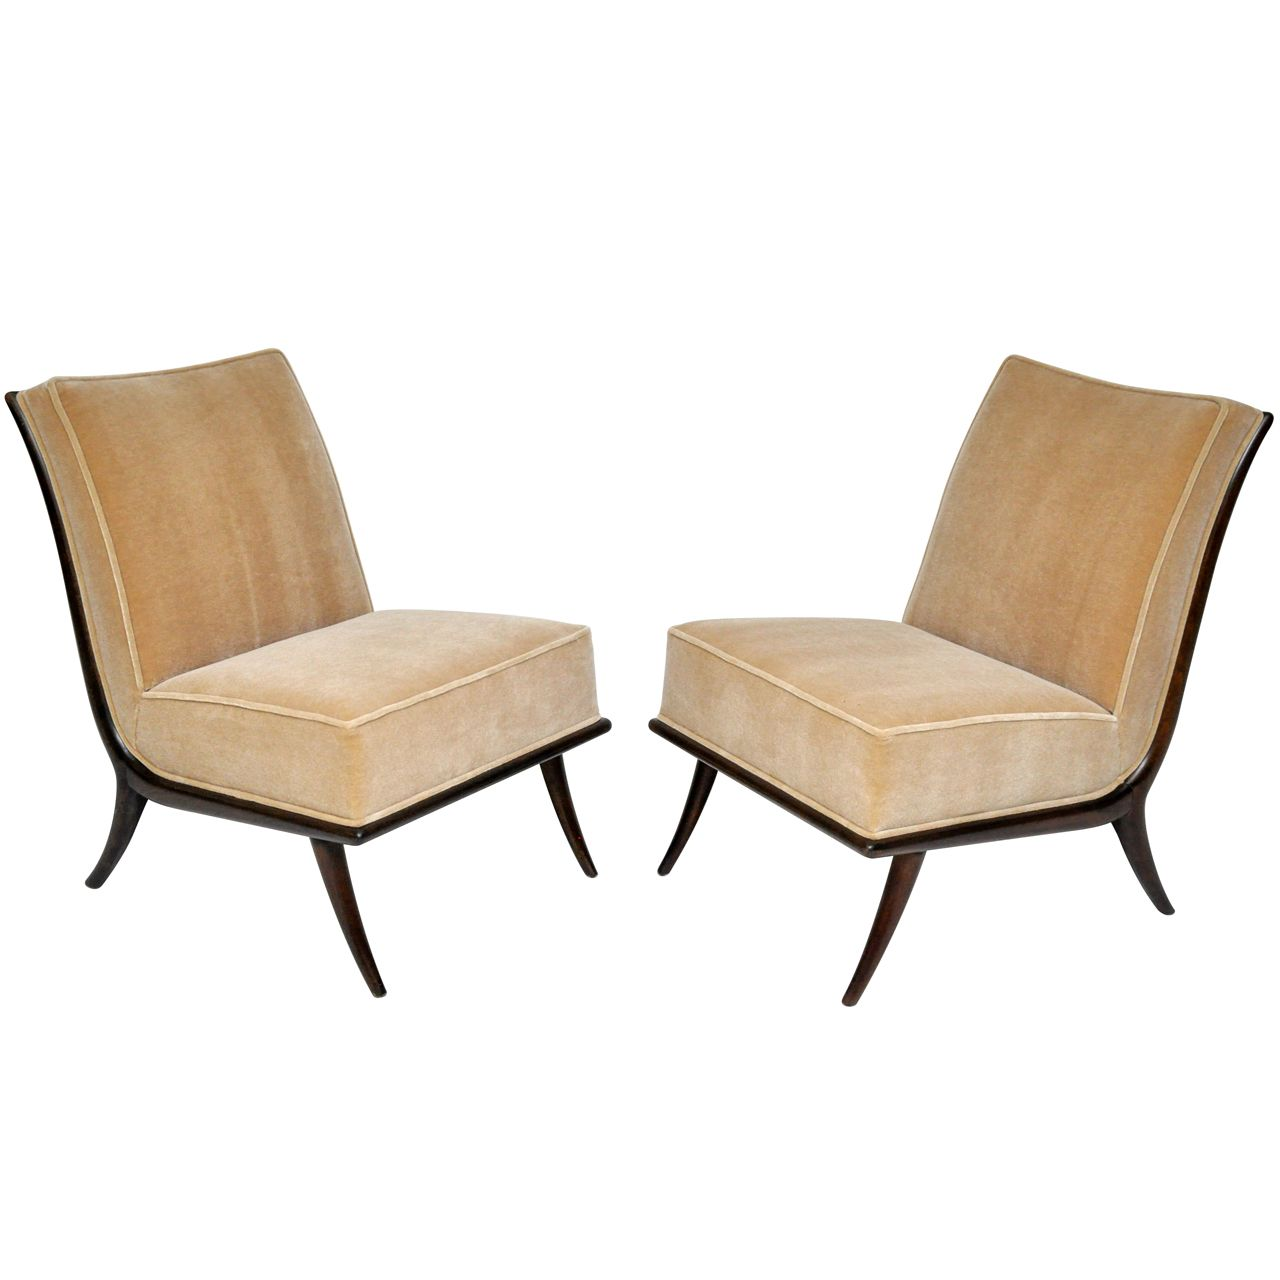 Sensational Pin By Tom Hanson On Virtual Decorating Furniture Slipper Theyellowbook Wood Chair Design Ideas Theyellowbookinfo